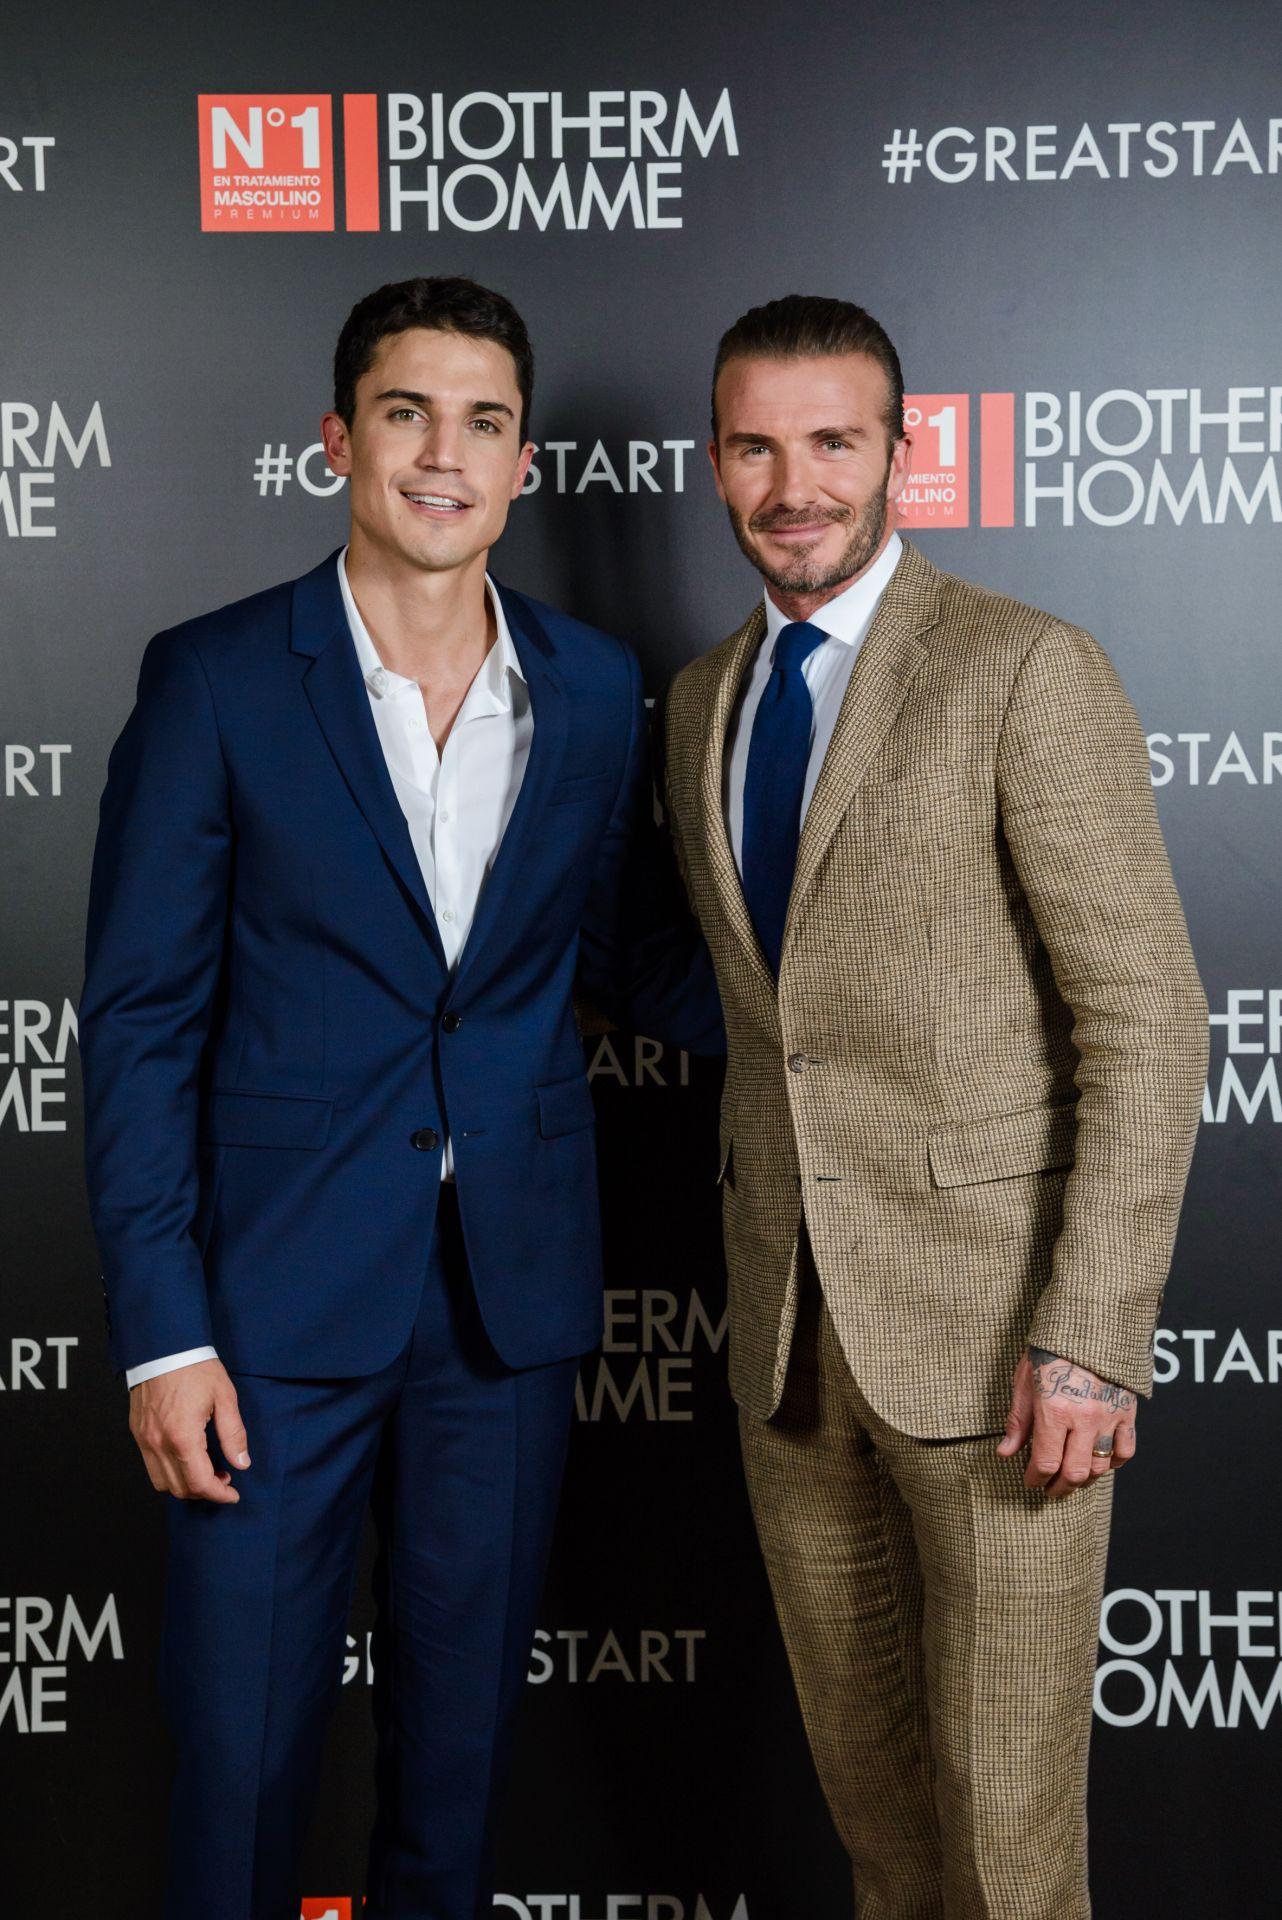 ¿Cuánto mide Álex González? (Actor) - Altura David-Beckham-with-Alex-Gonzalez-for-Biotherm-Homme-copia